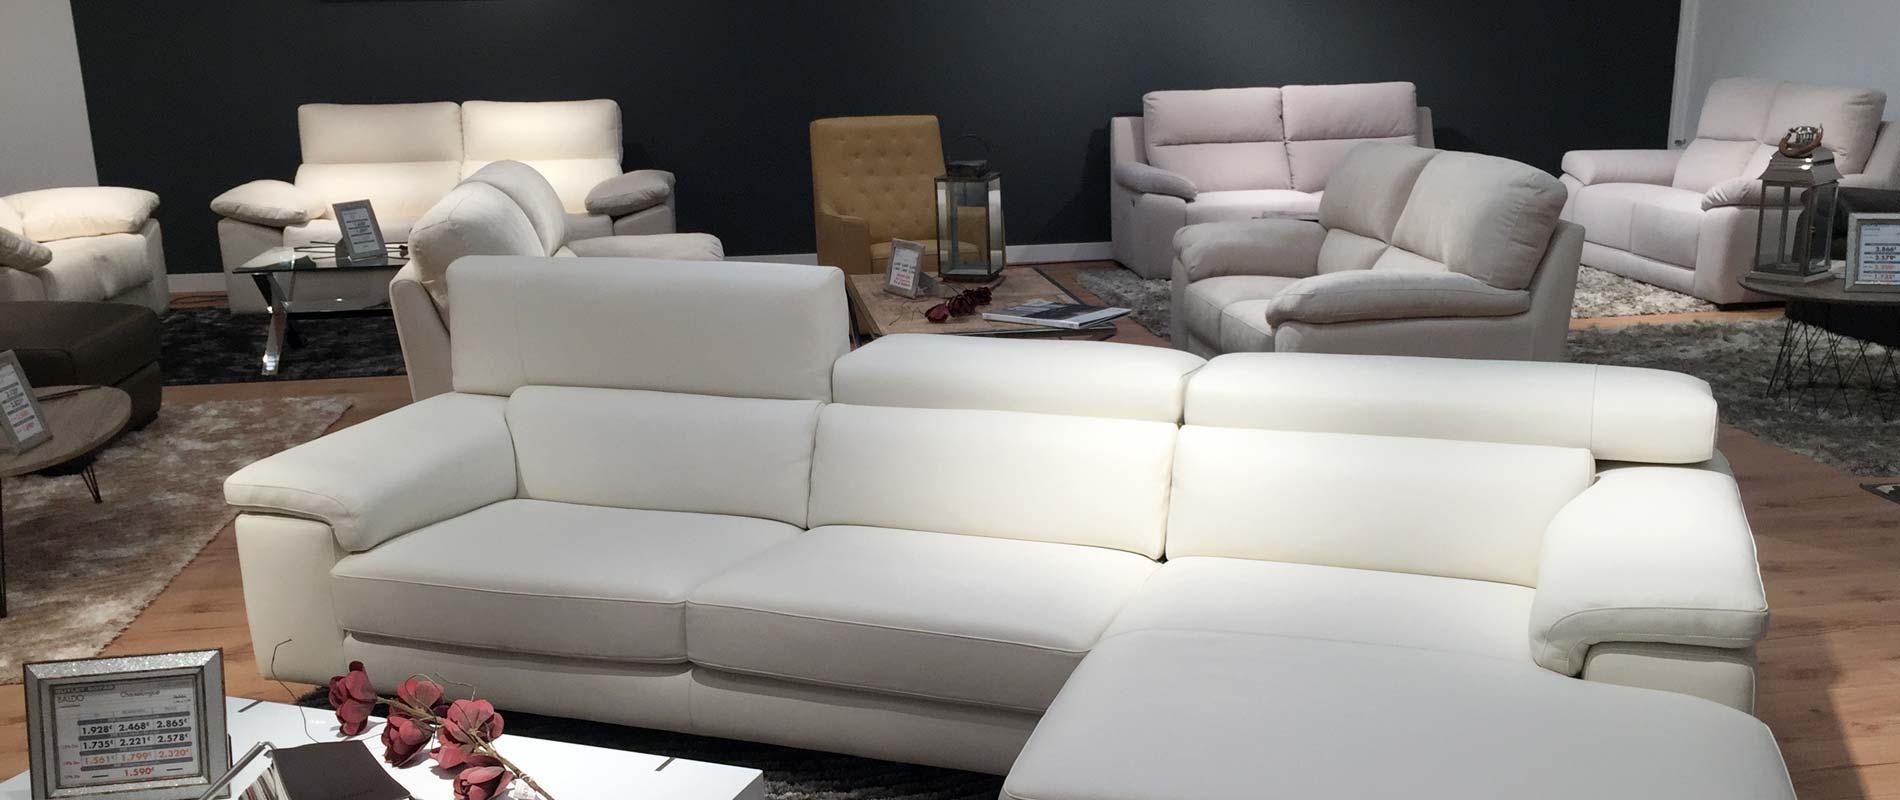 outlet sofas bench behind sofa tienda sofás európolis baratos madrid